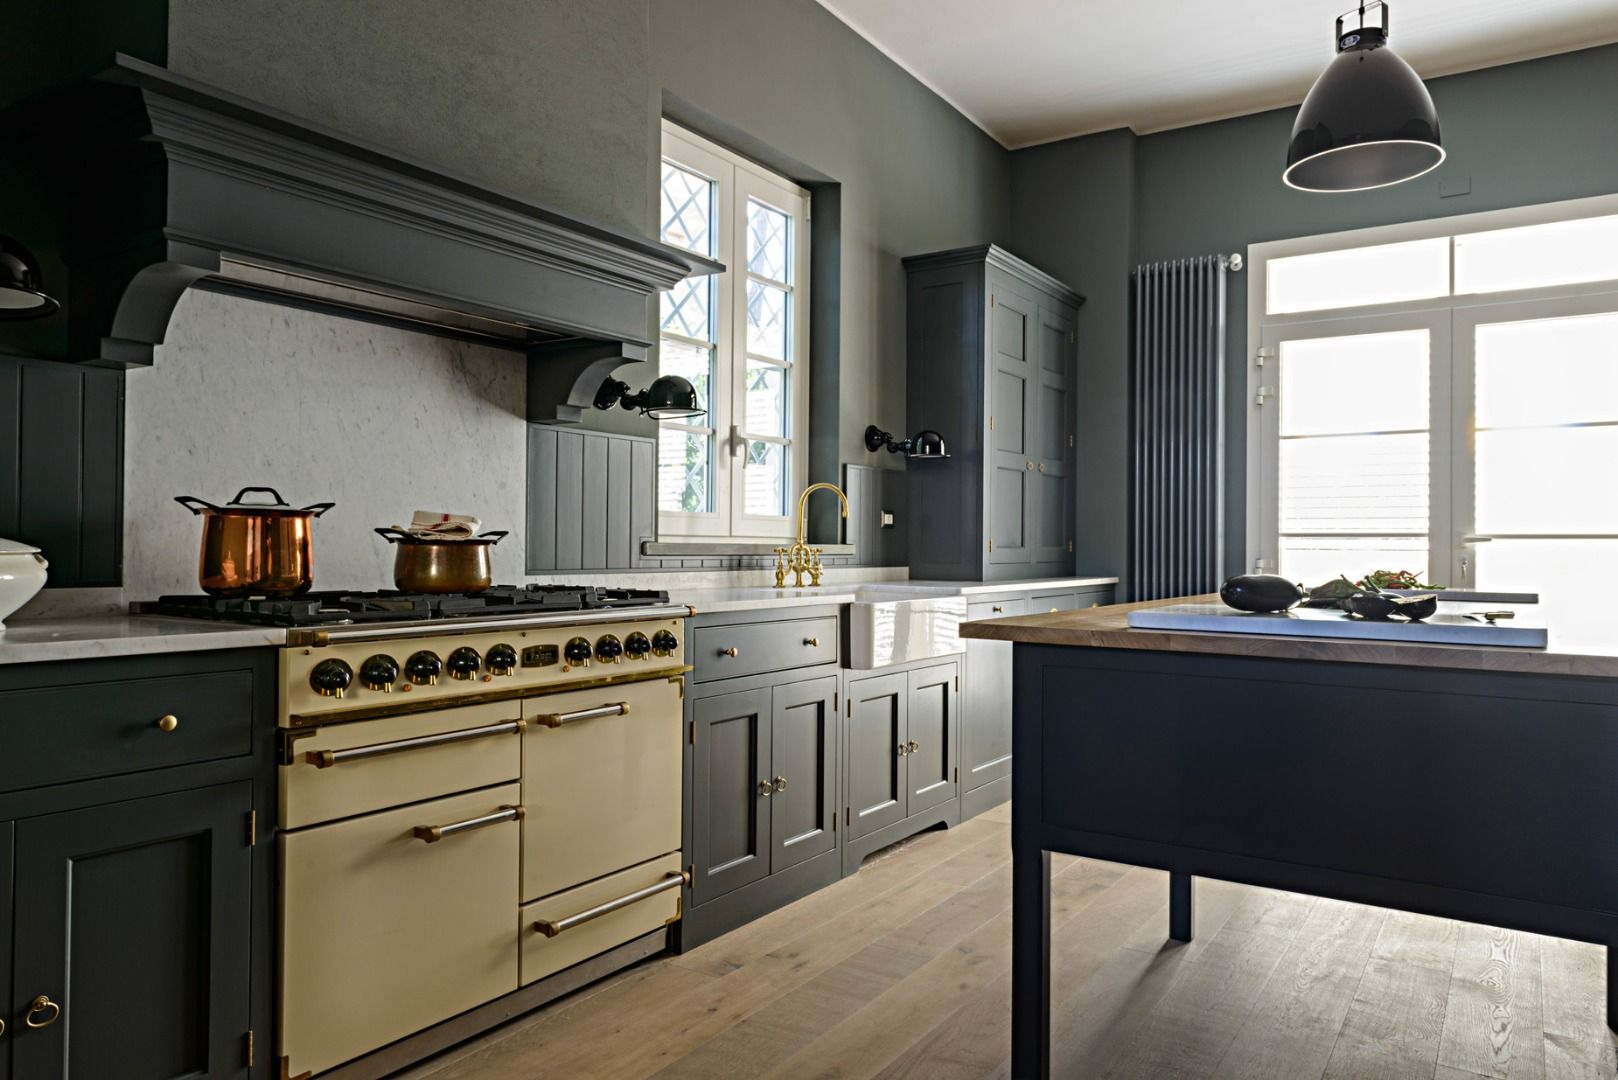 Cucine stile inglese cerca con google cucine google